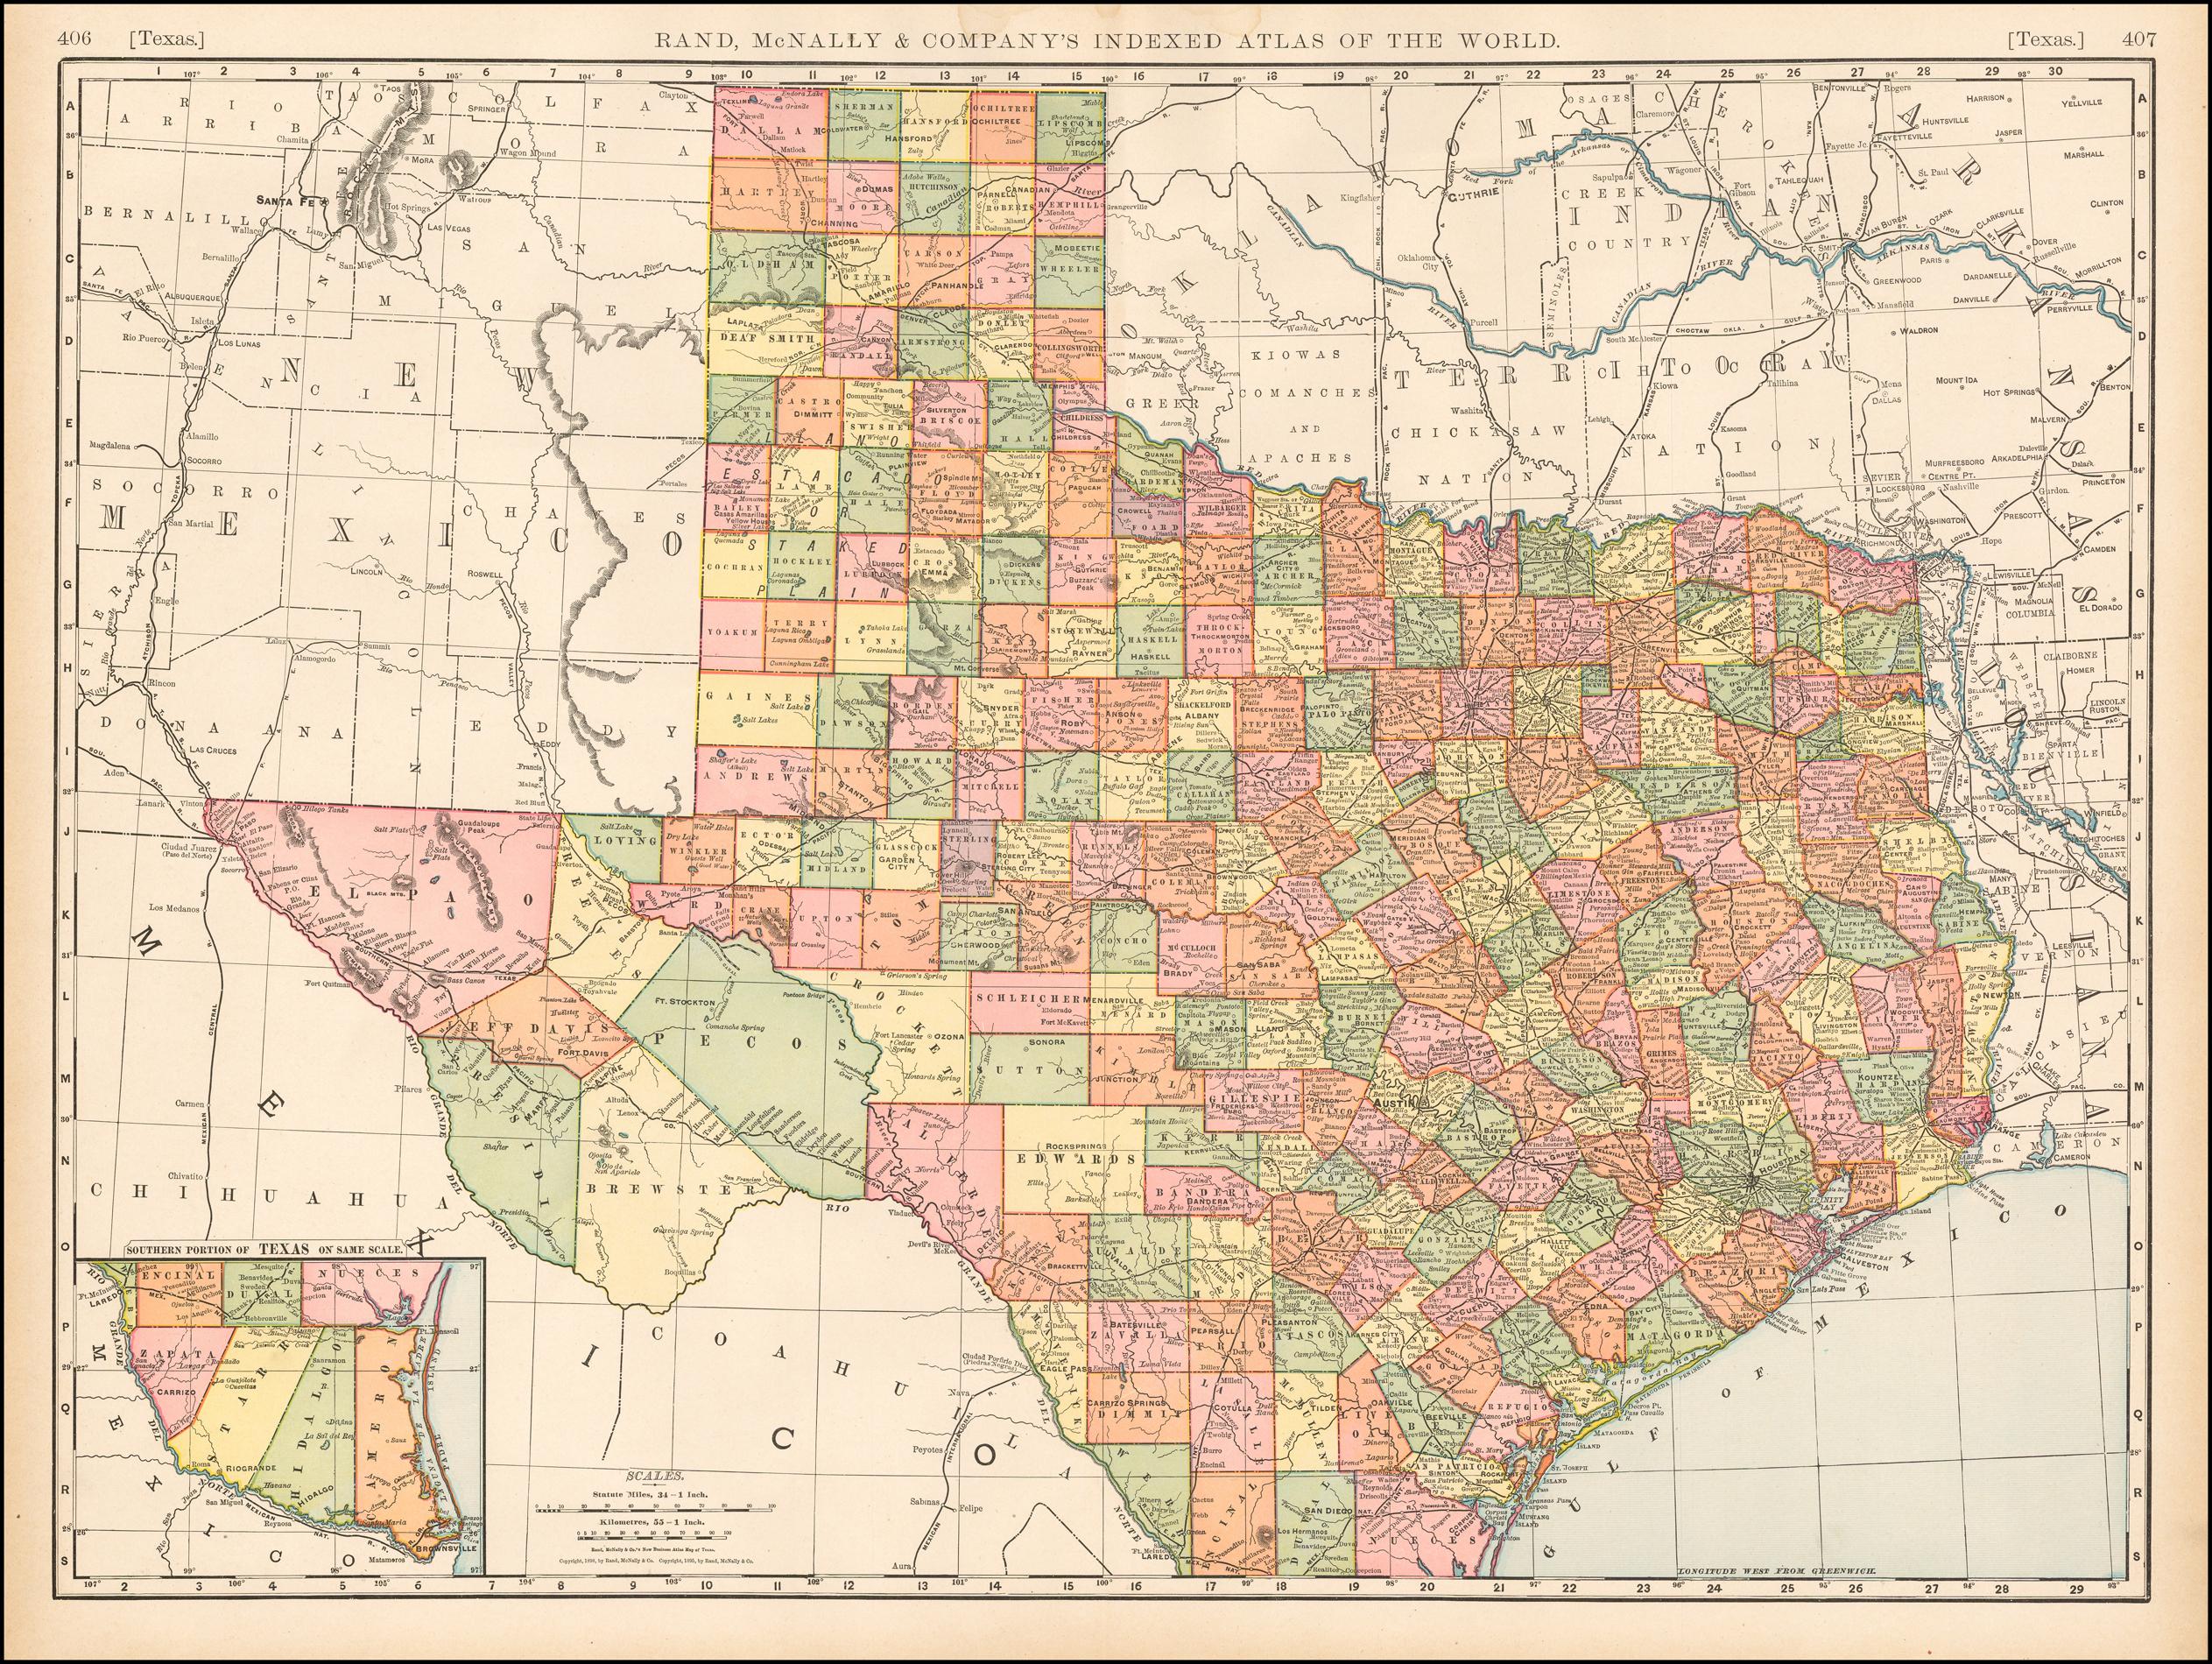 Rand Mcnally & Company's Indexed Atlas Of The World Map Of Texas - Texas Atlas Map